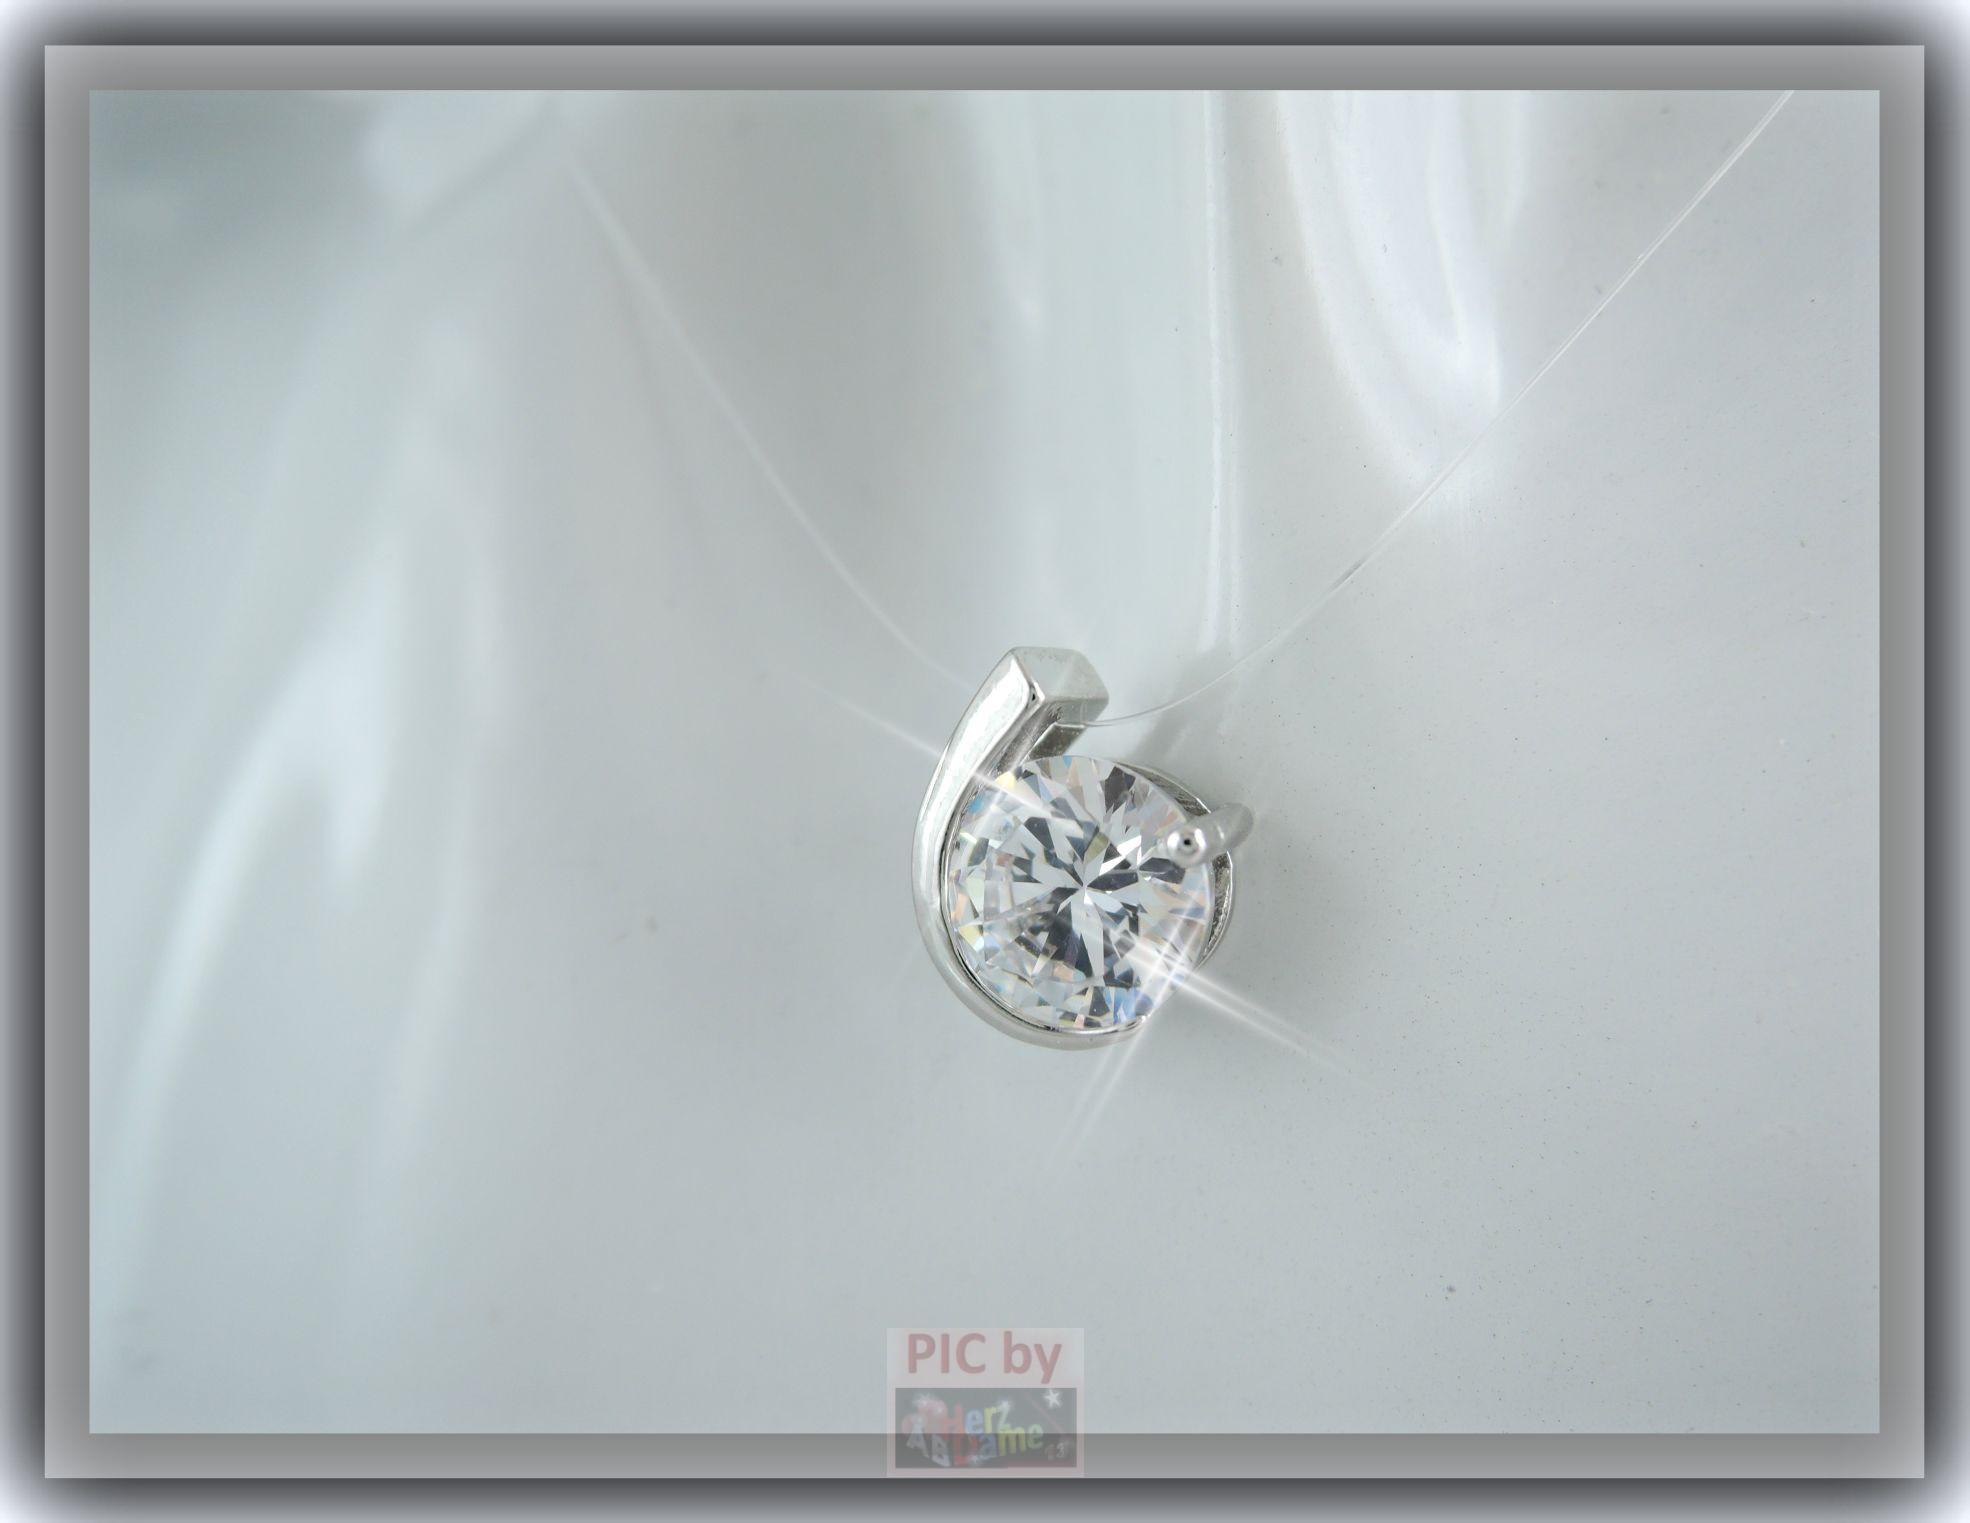 ab skin collier nylon kette schwebender stein zirkonia silber klar 96 ebay. Black Bedroom Furniture Sets. Home Design Ideas